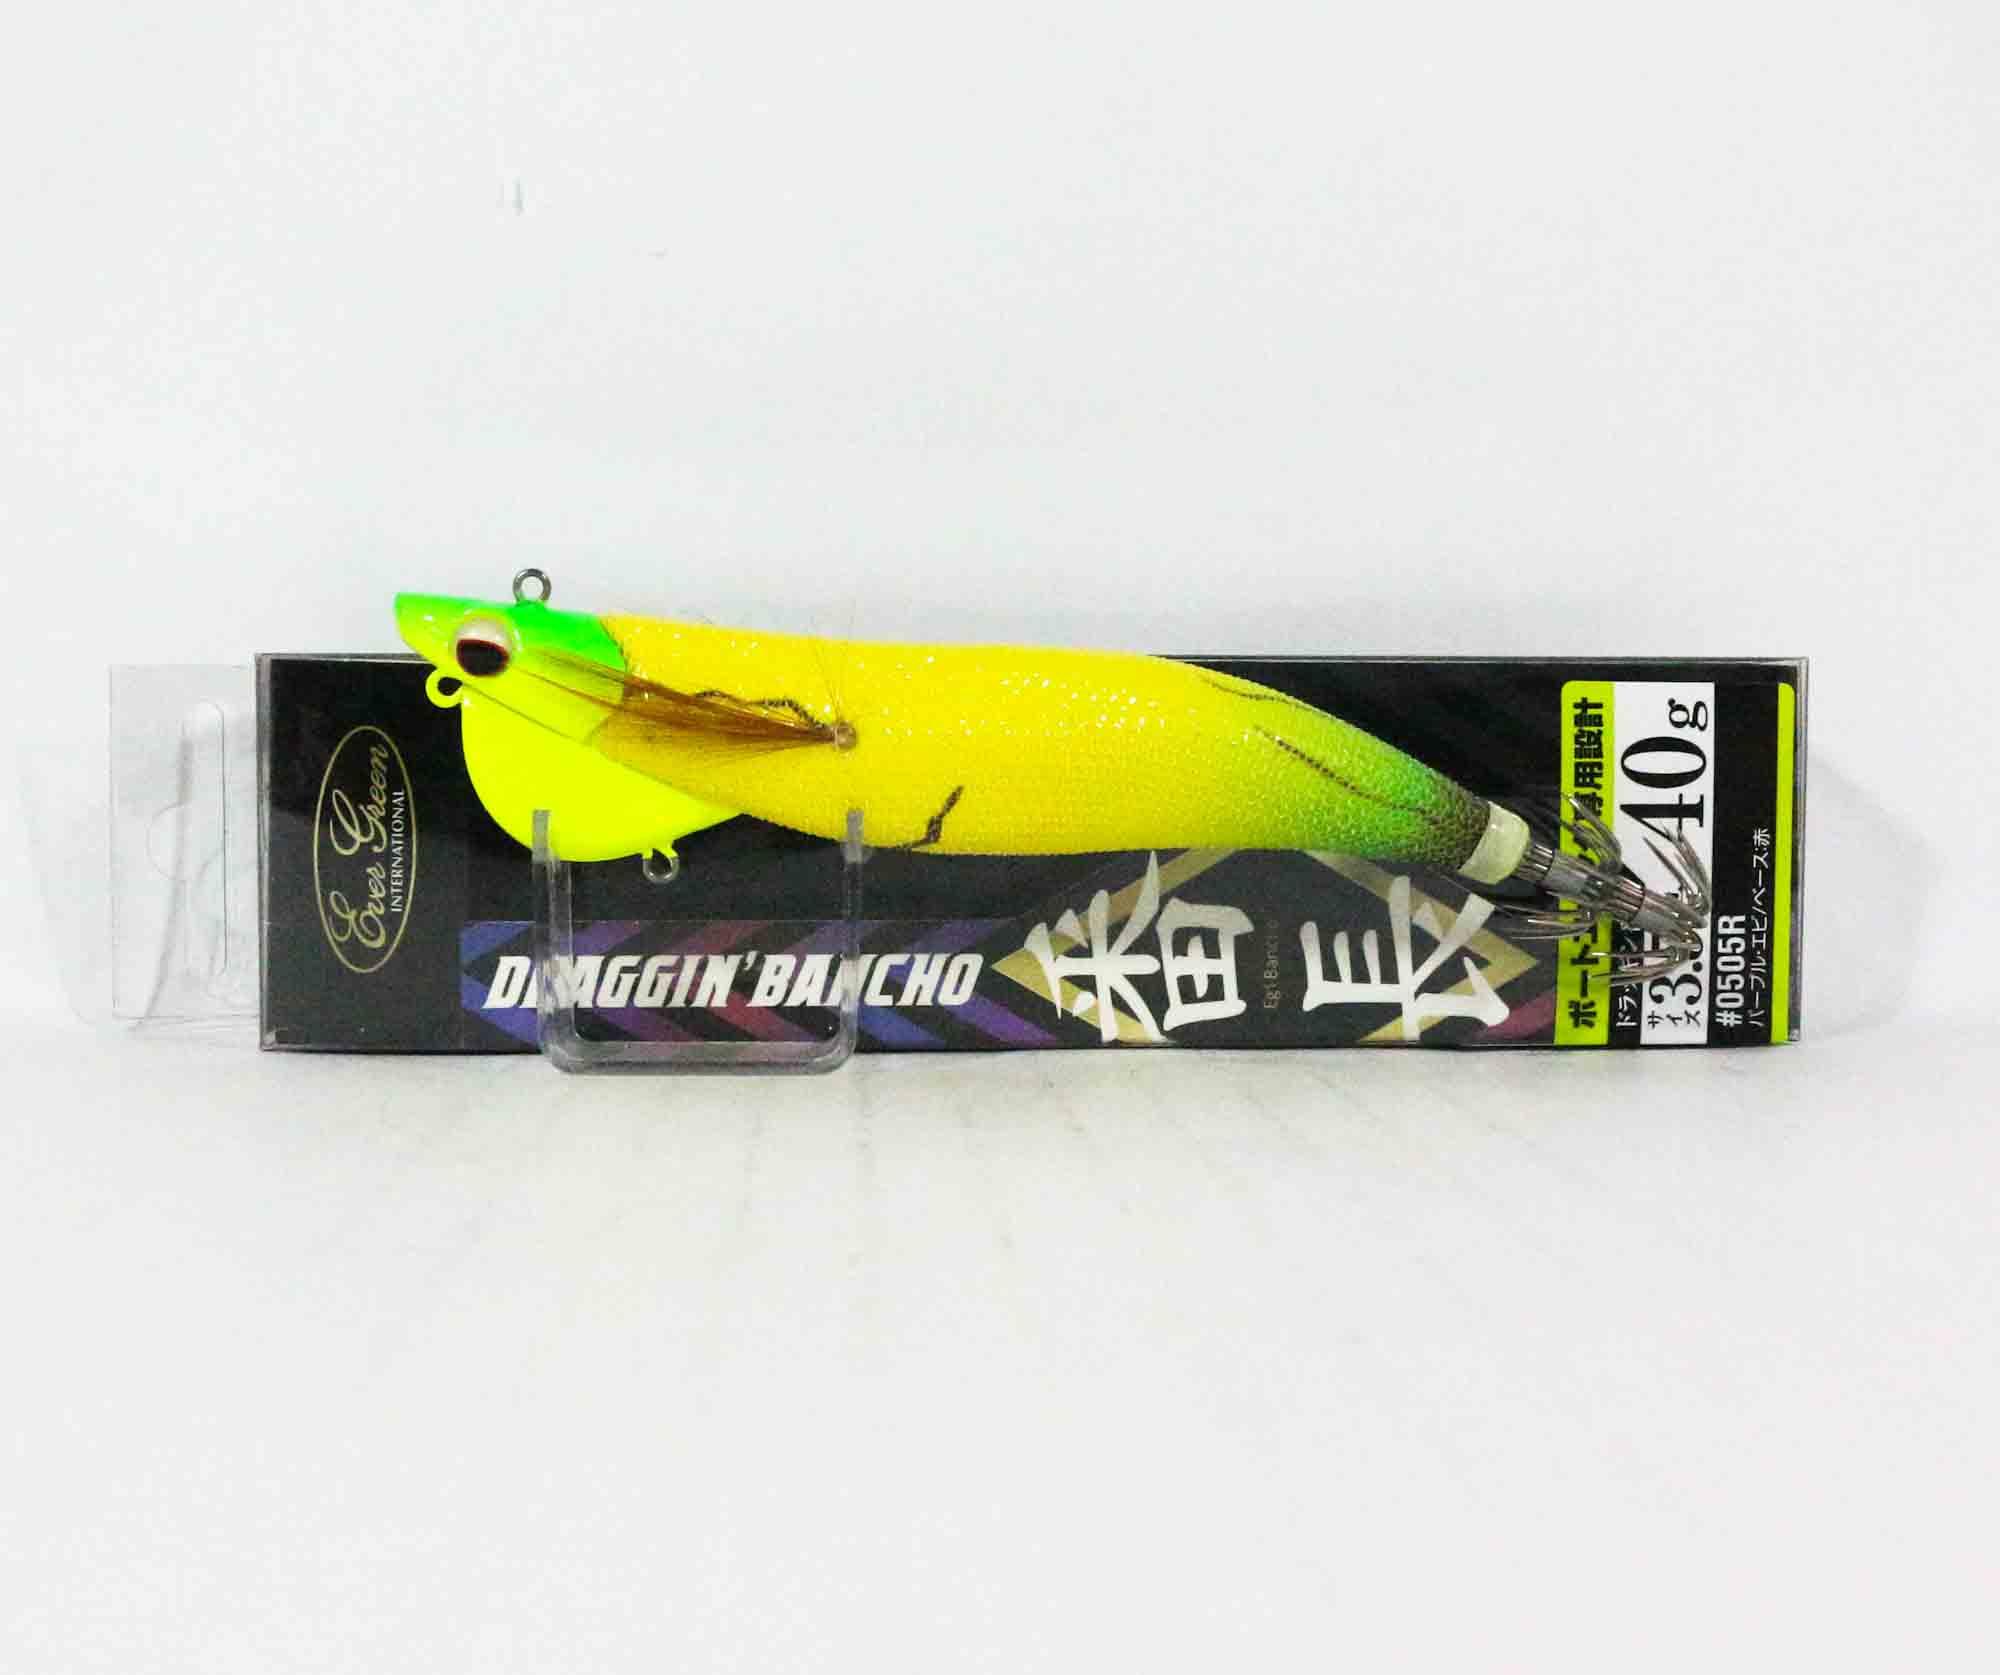 Evergreen Draggin Bancho Squid Jig Lure 3.5 40 grams 0801Y (0619)